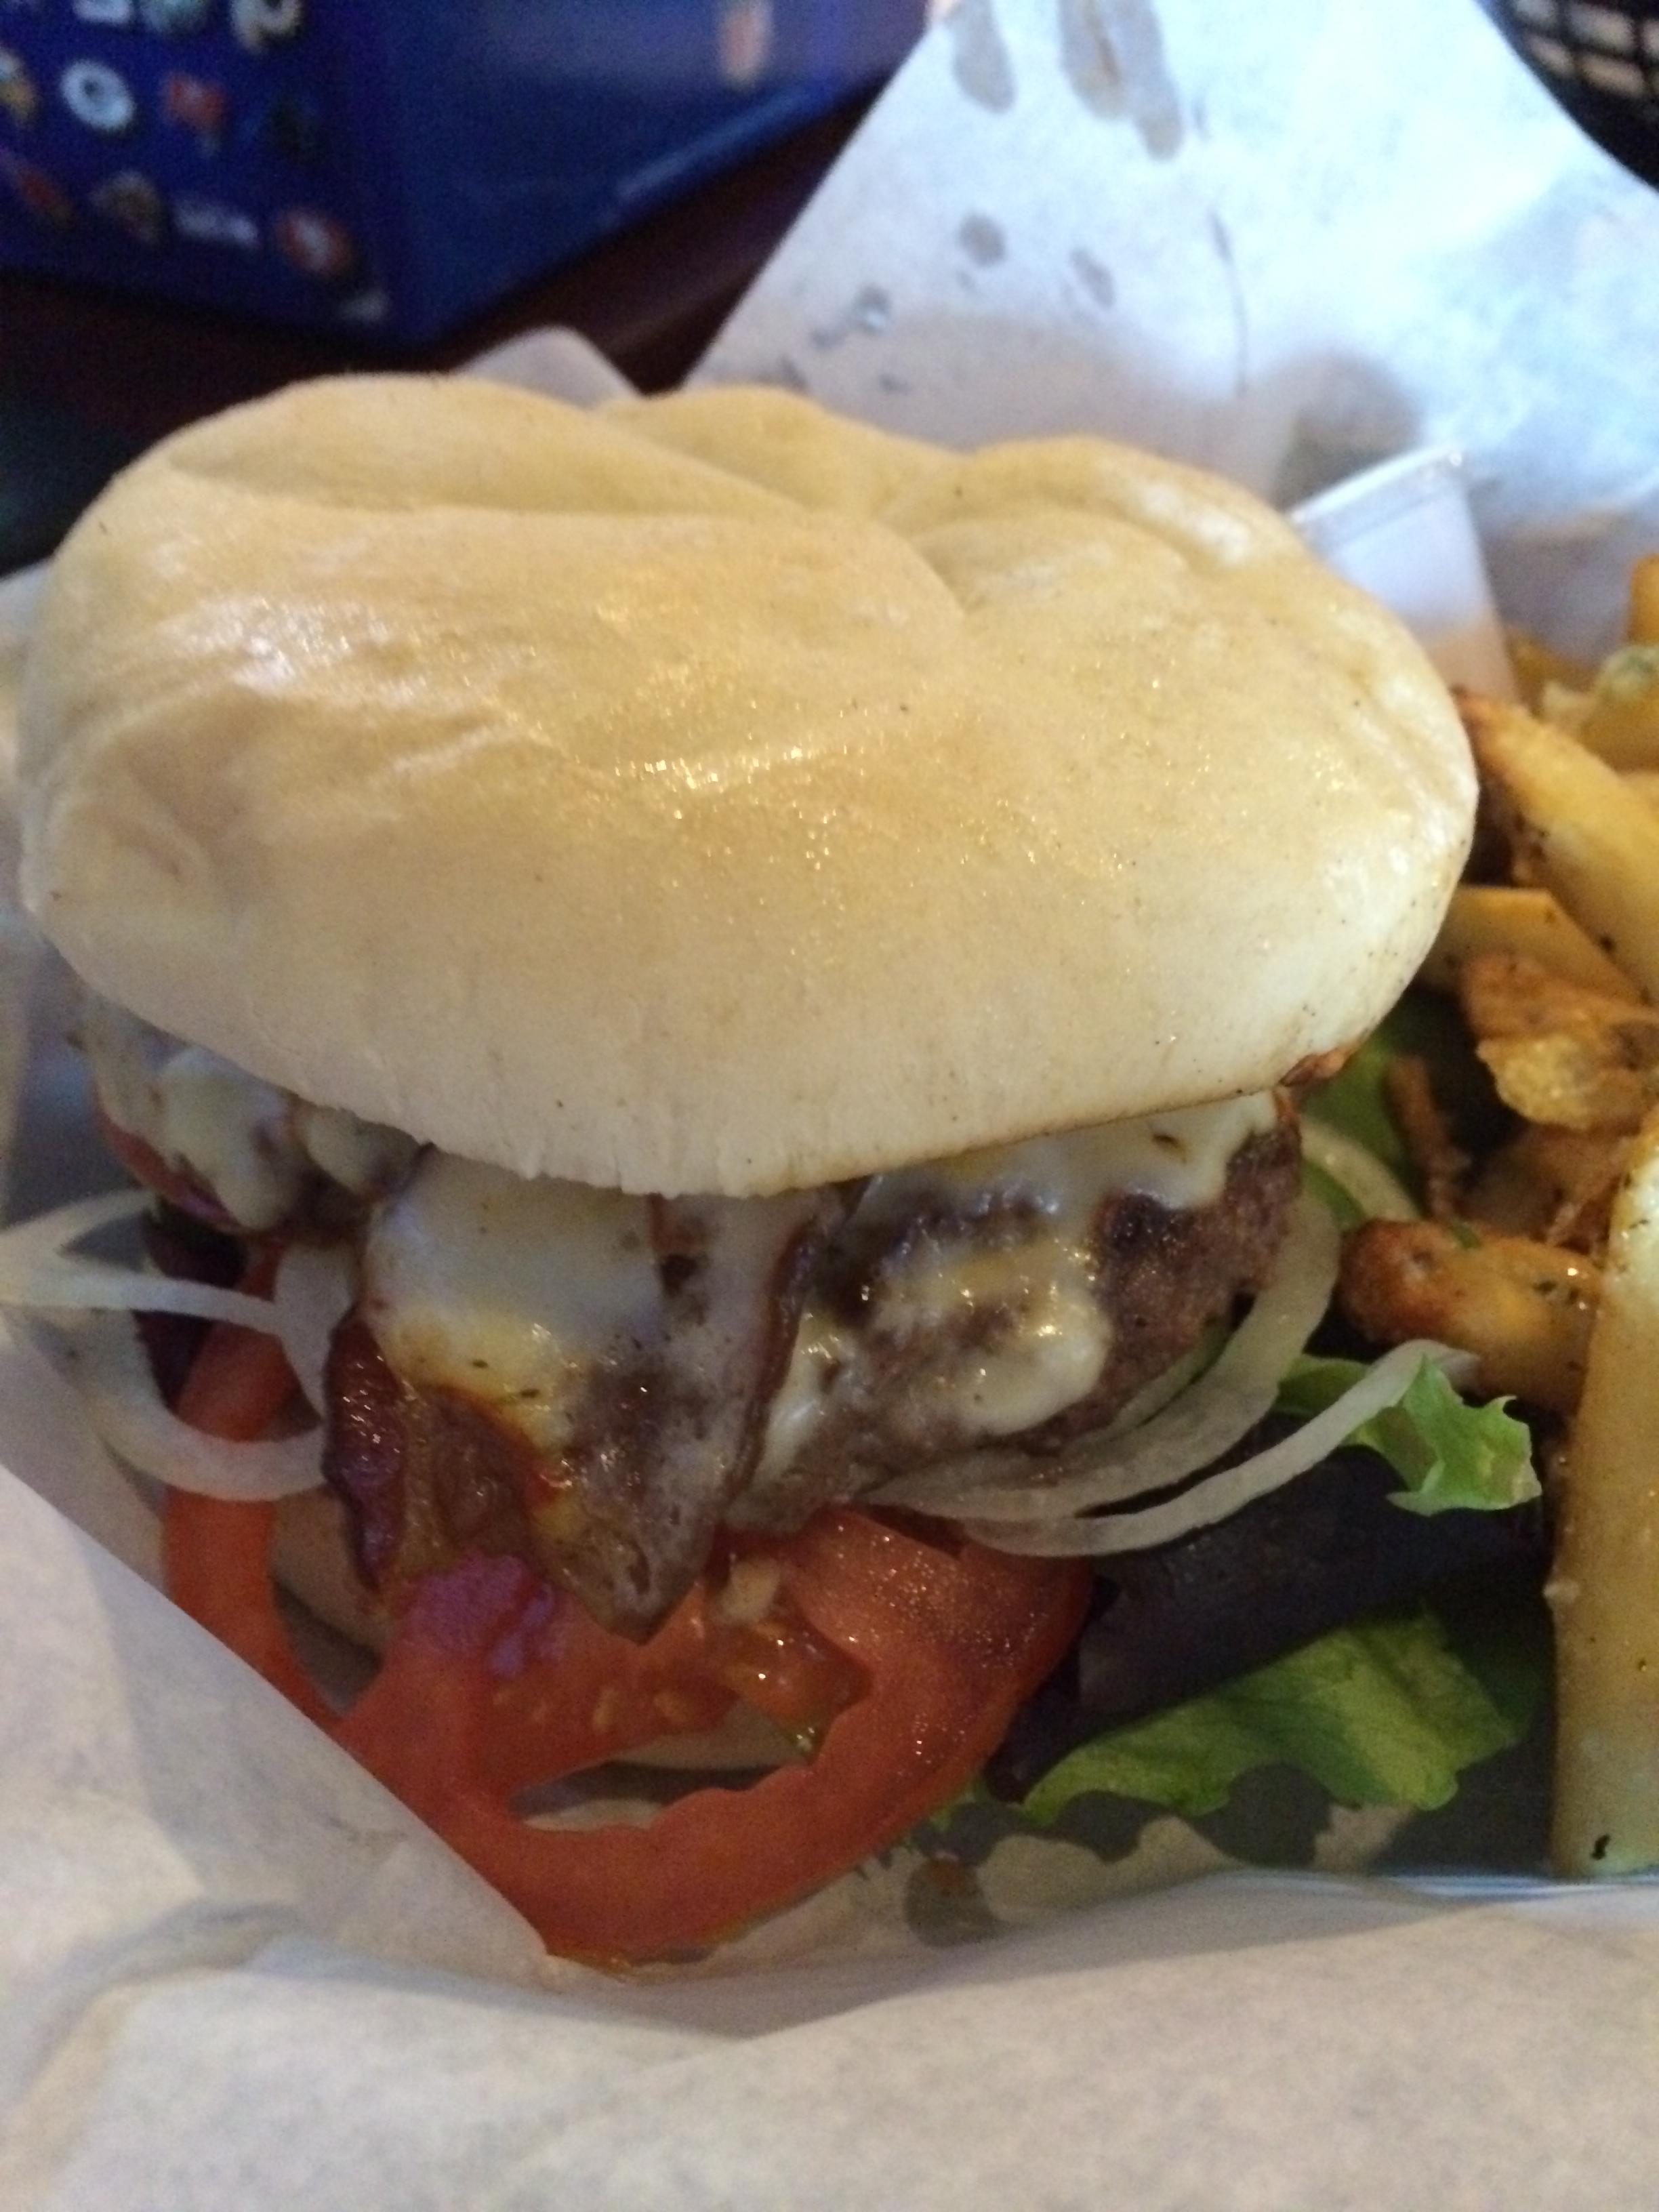 Antelope burger special